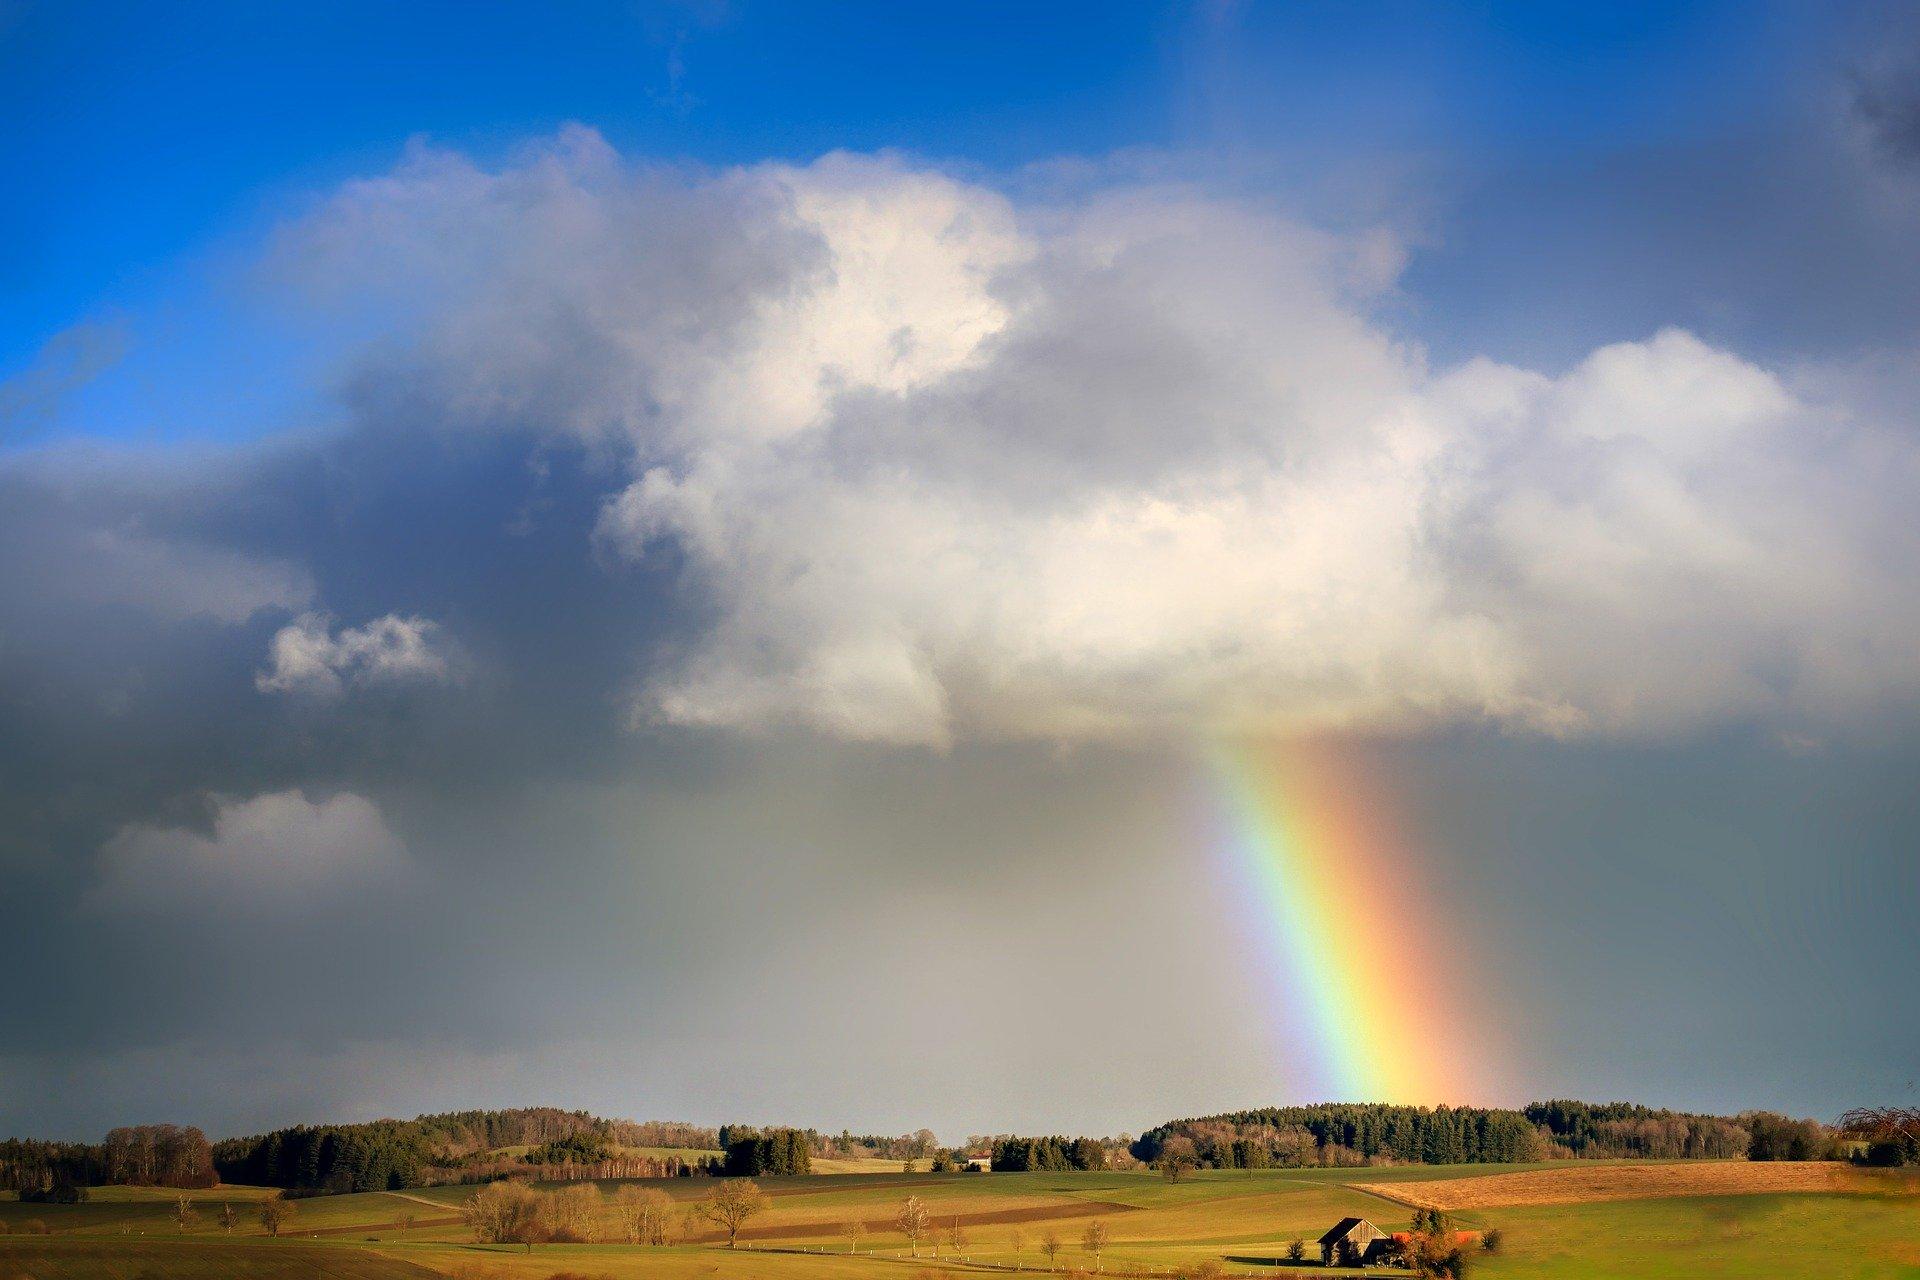 Rainbow from a cloud